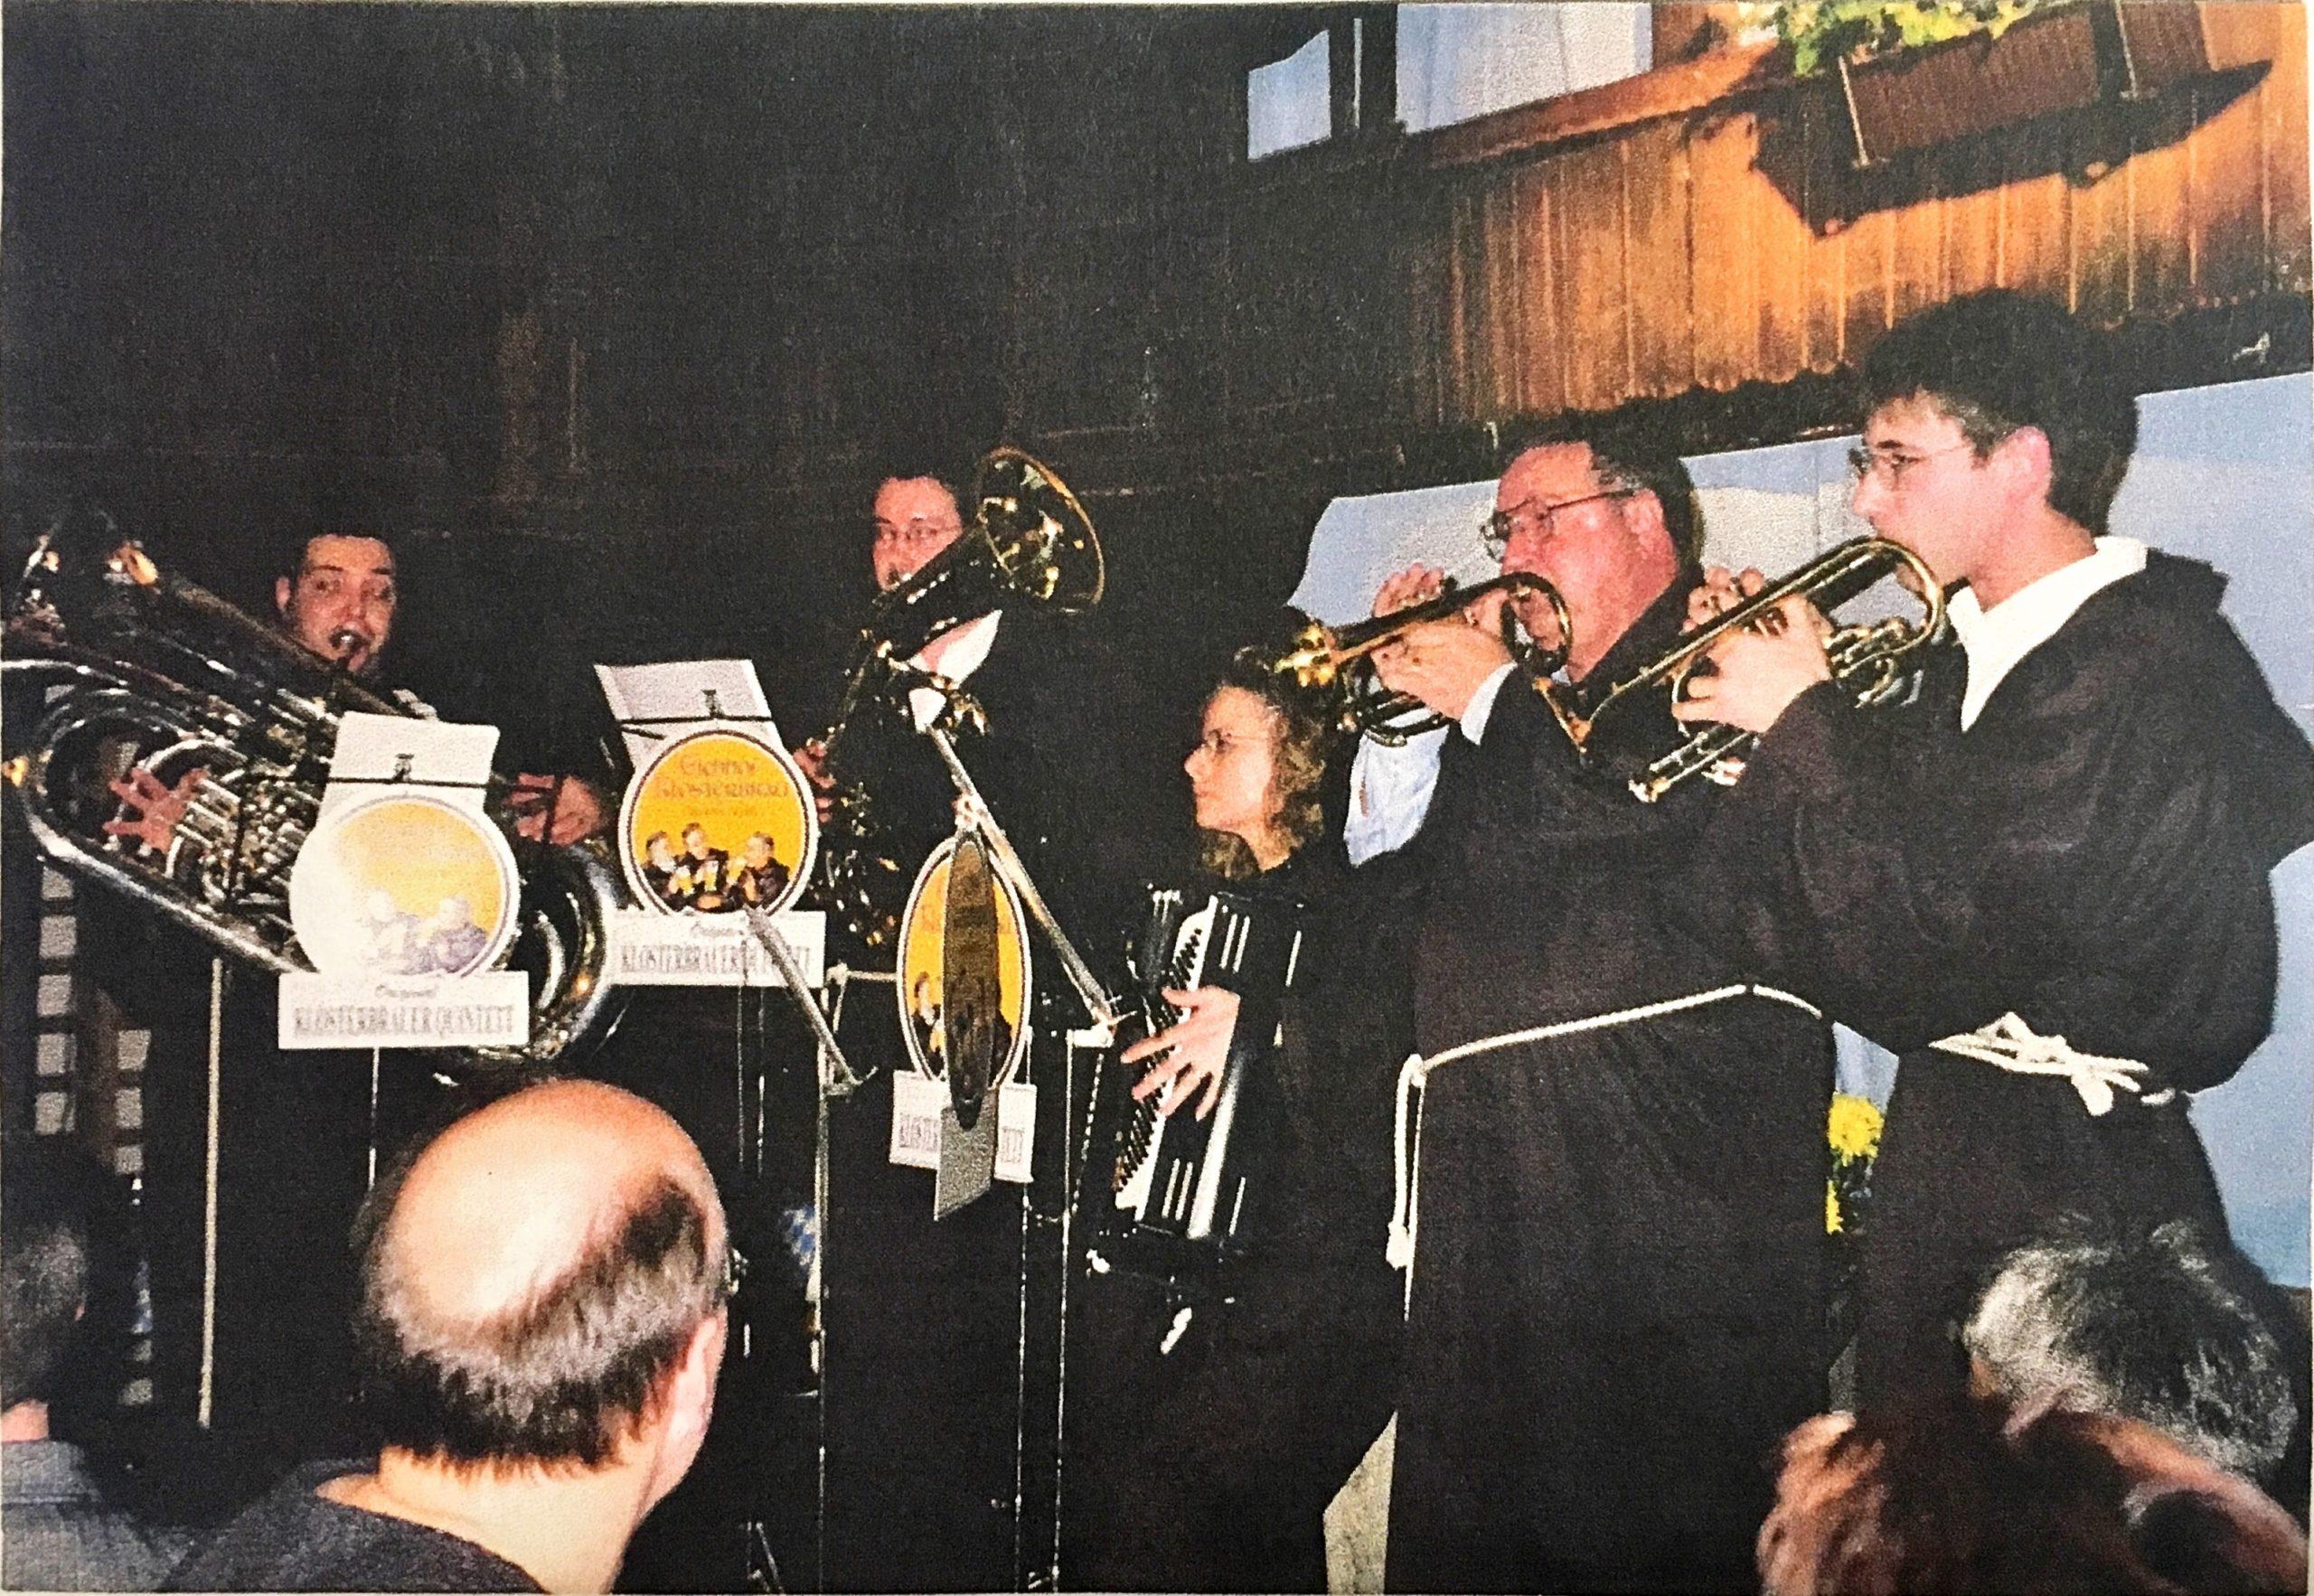 1999 - Unterhaltungskonzert Musikantenstadl